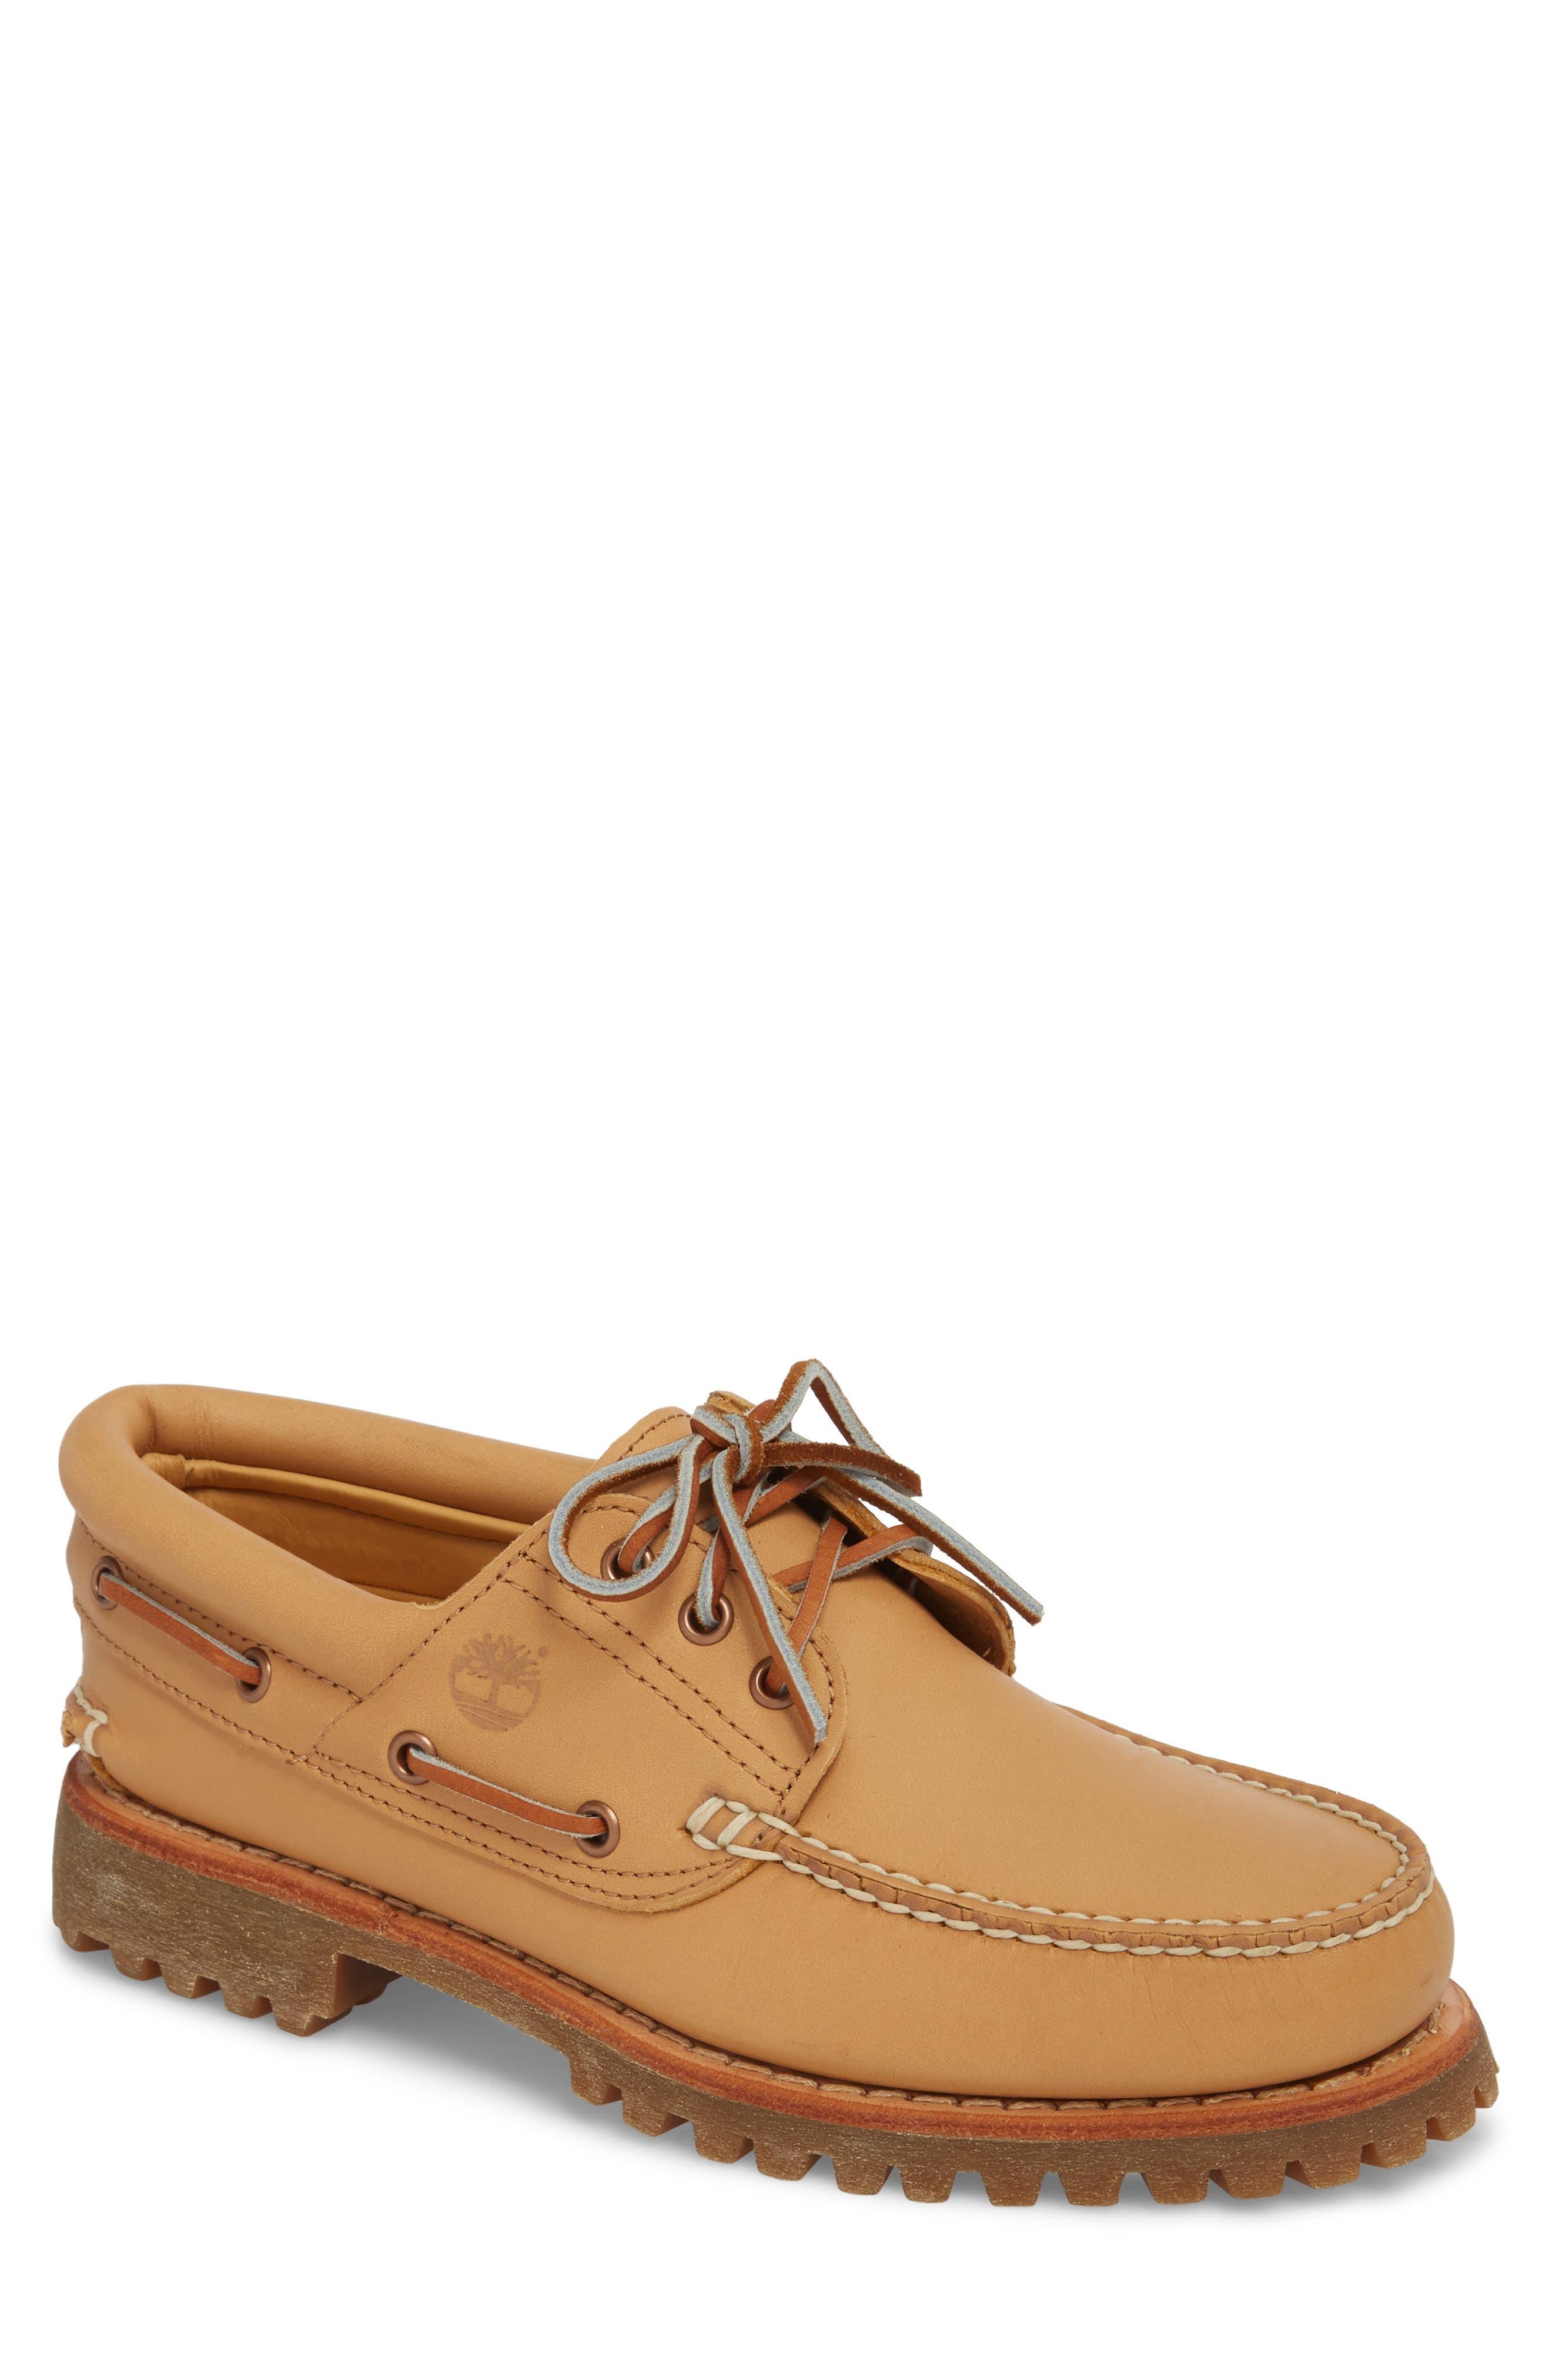 Lug Classic Boat Shoe,                             Main thumbnail 1, color,                             Natural Leahter